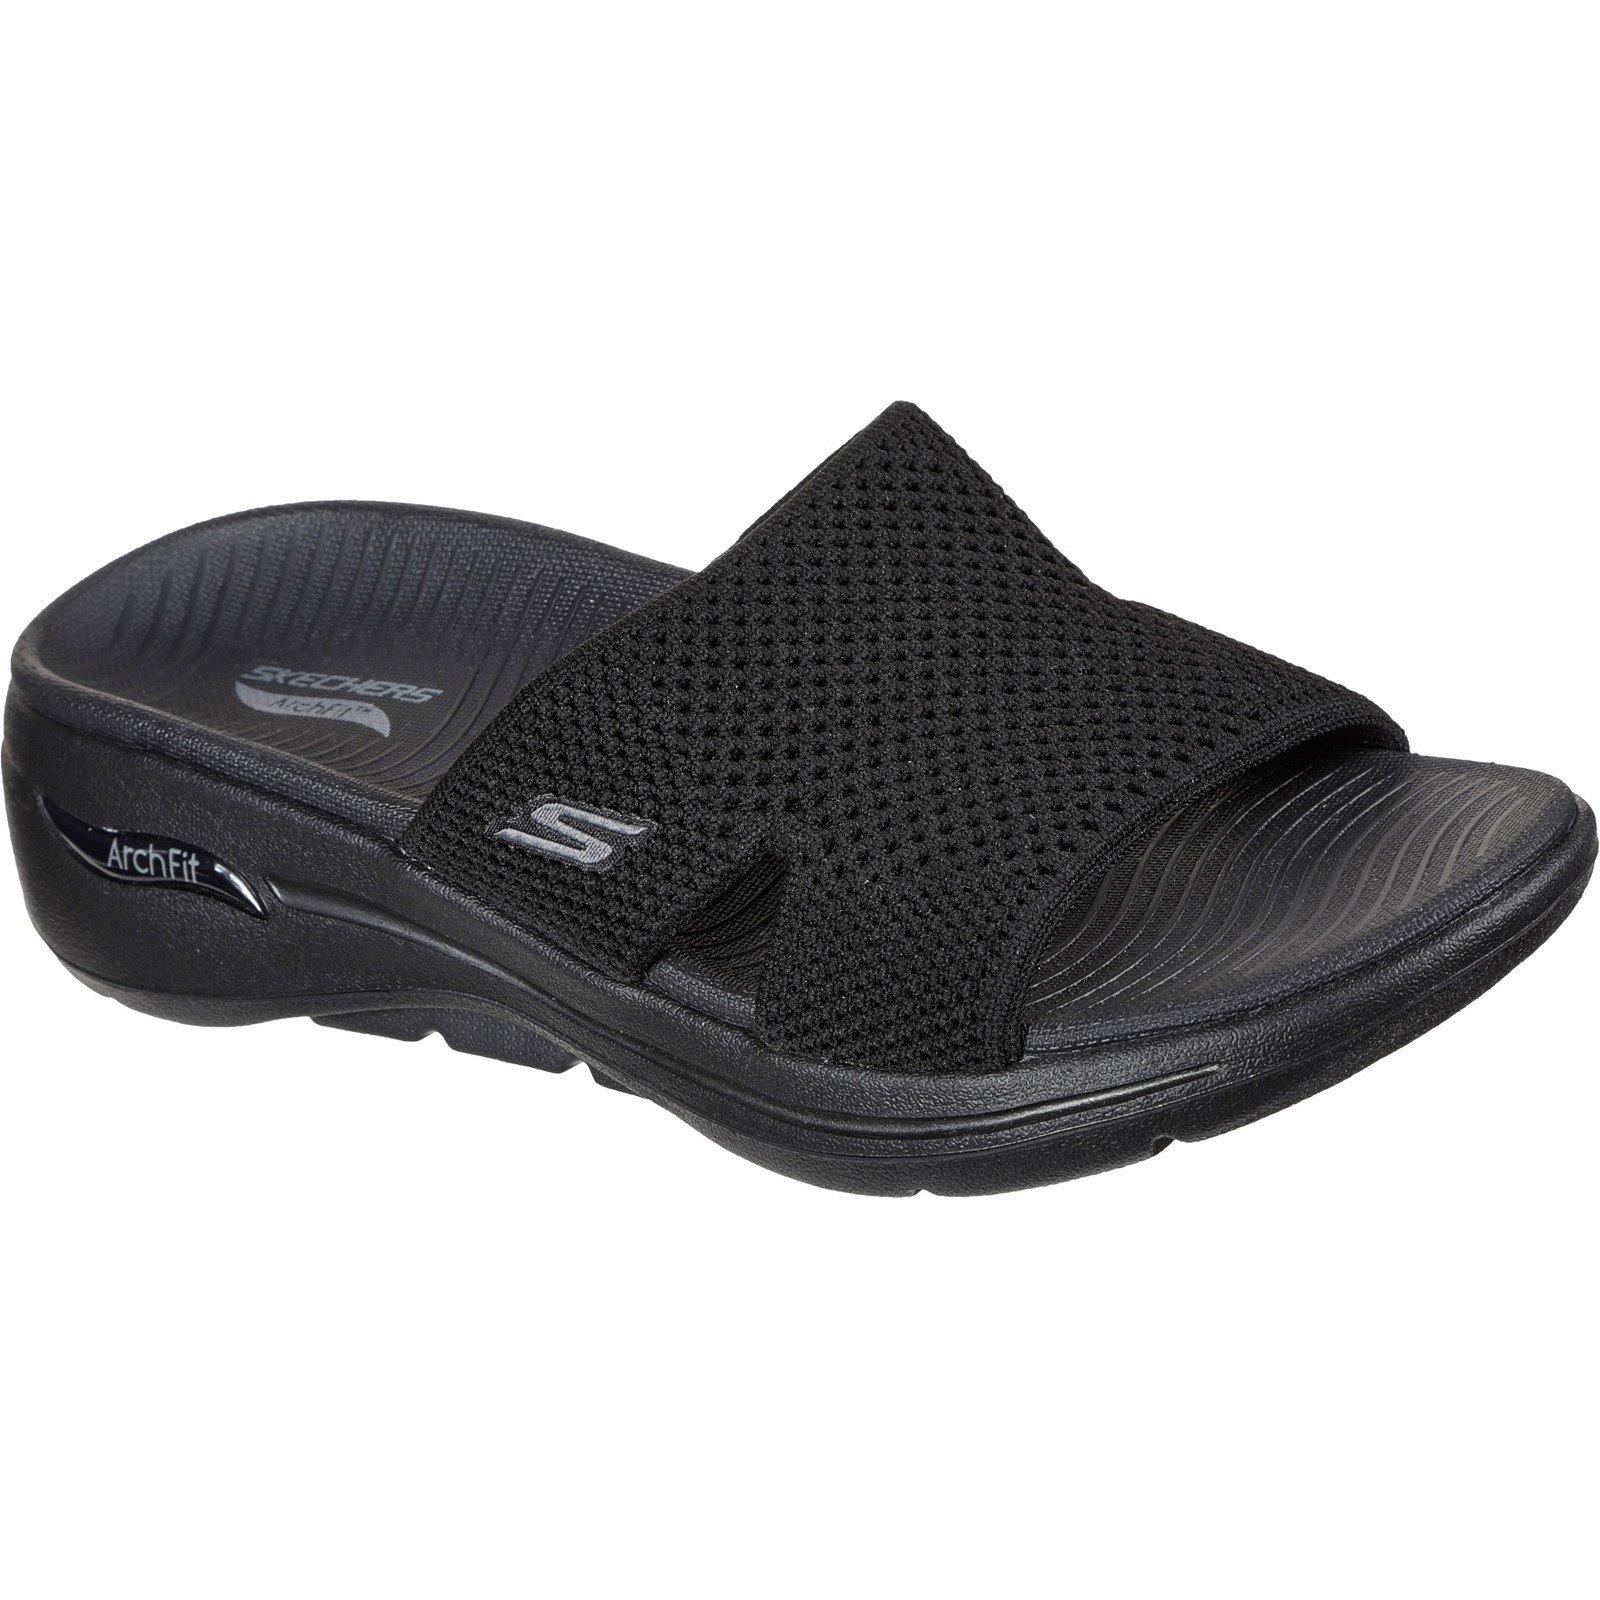 Skechers Women's Go Walk Arch Fit Worthy Summer Sandal Various Colours 32152 - Black 7